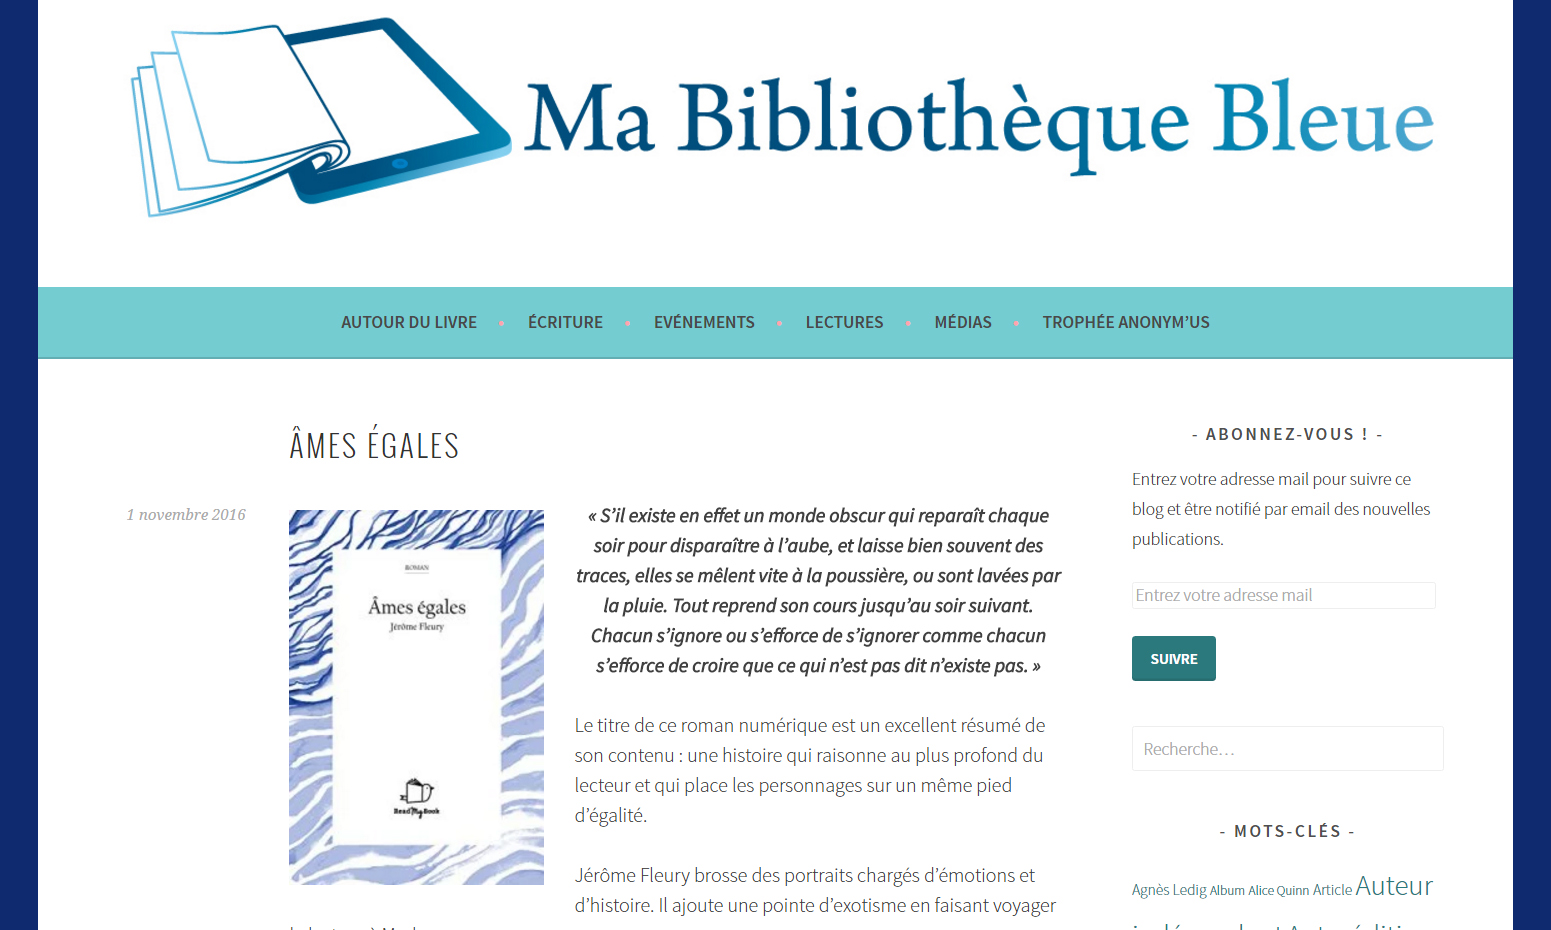 Ma Bibliothèque Bleue : Âmes égales